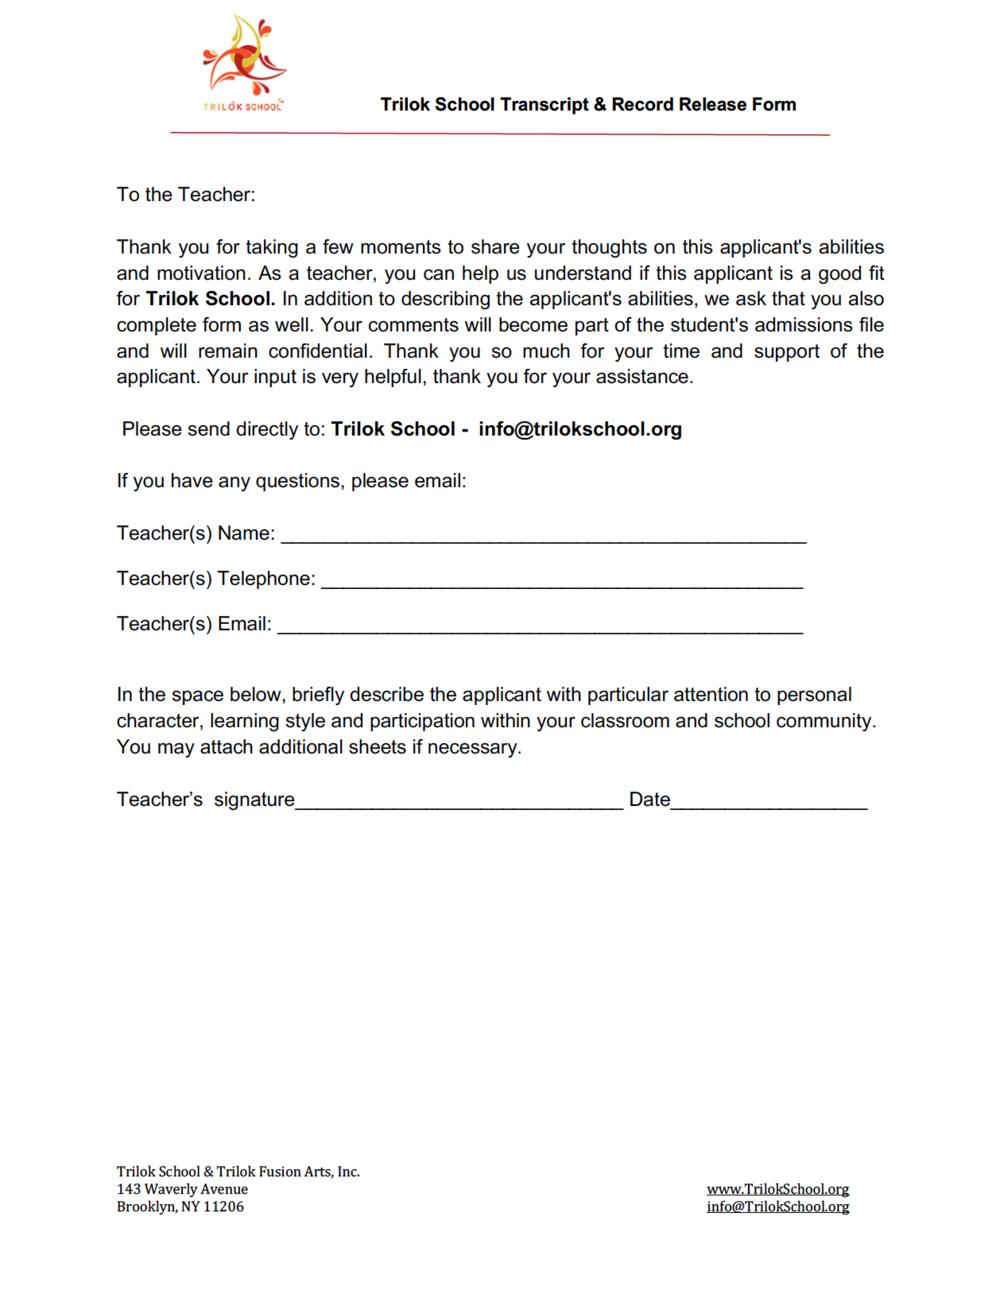 Trilok Transcript & Record Release Form Page 2